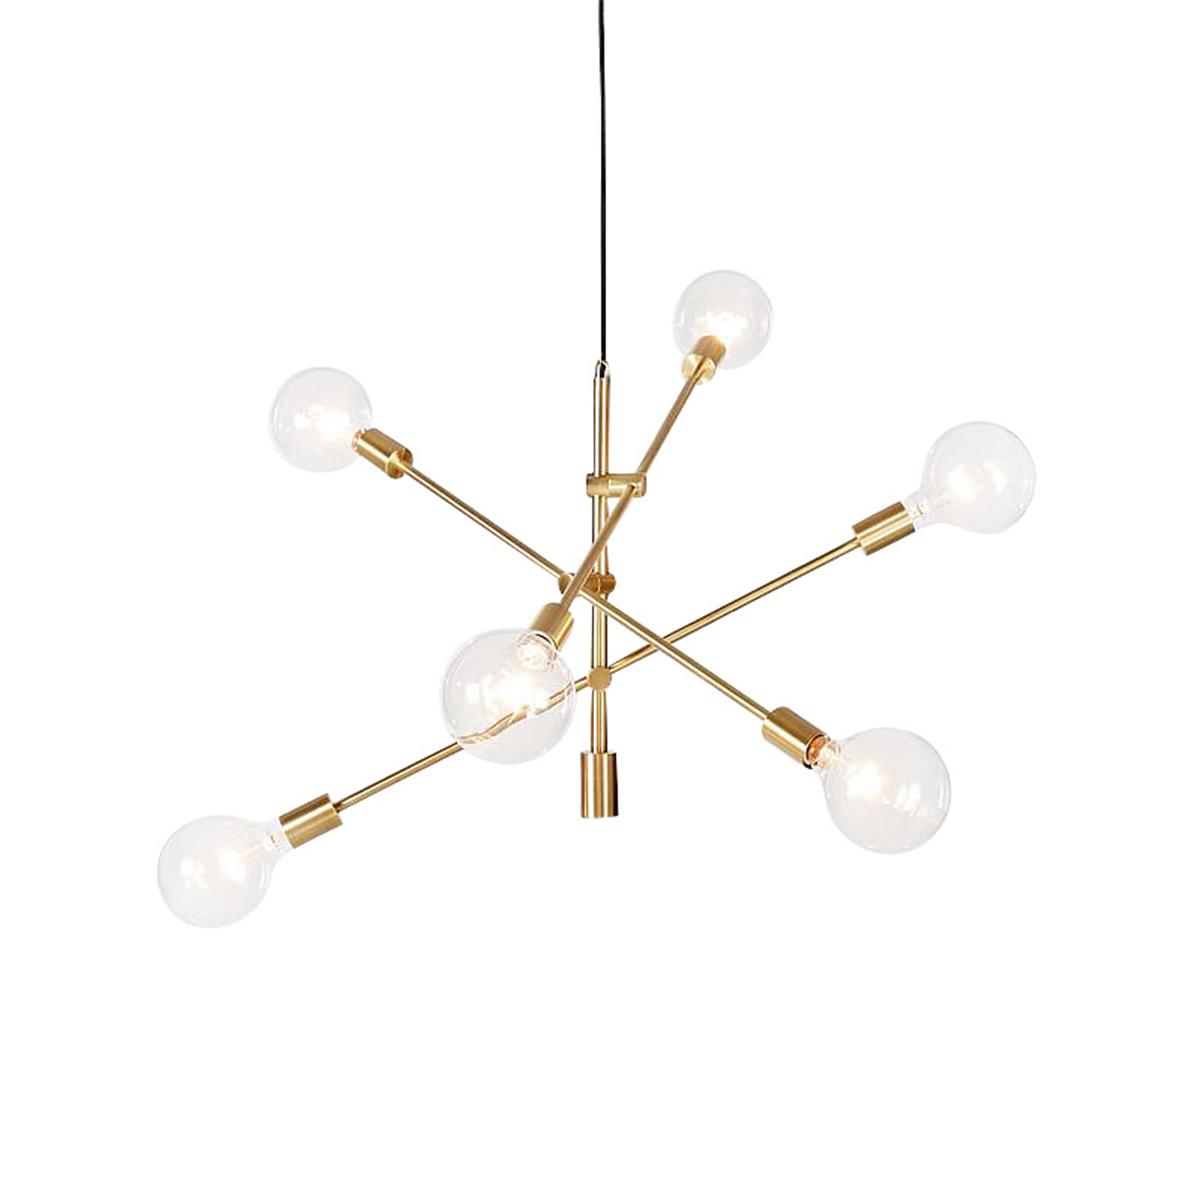 Modern Chandeliers 6 Lights Pendant Lamp Industrial Metal